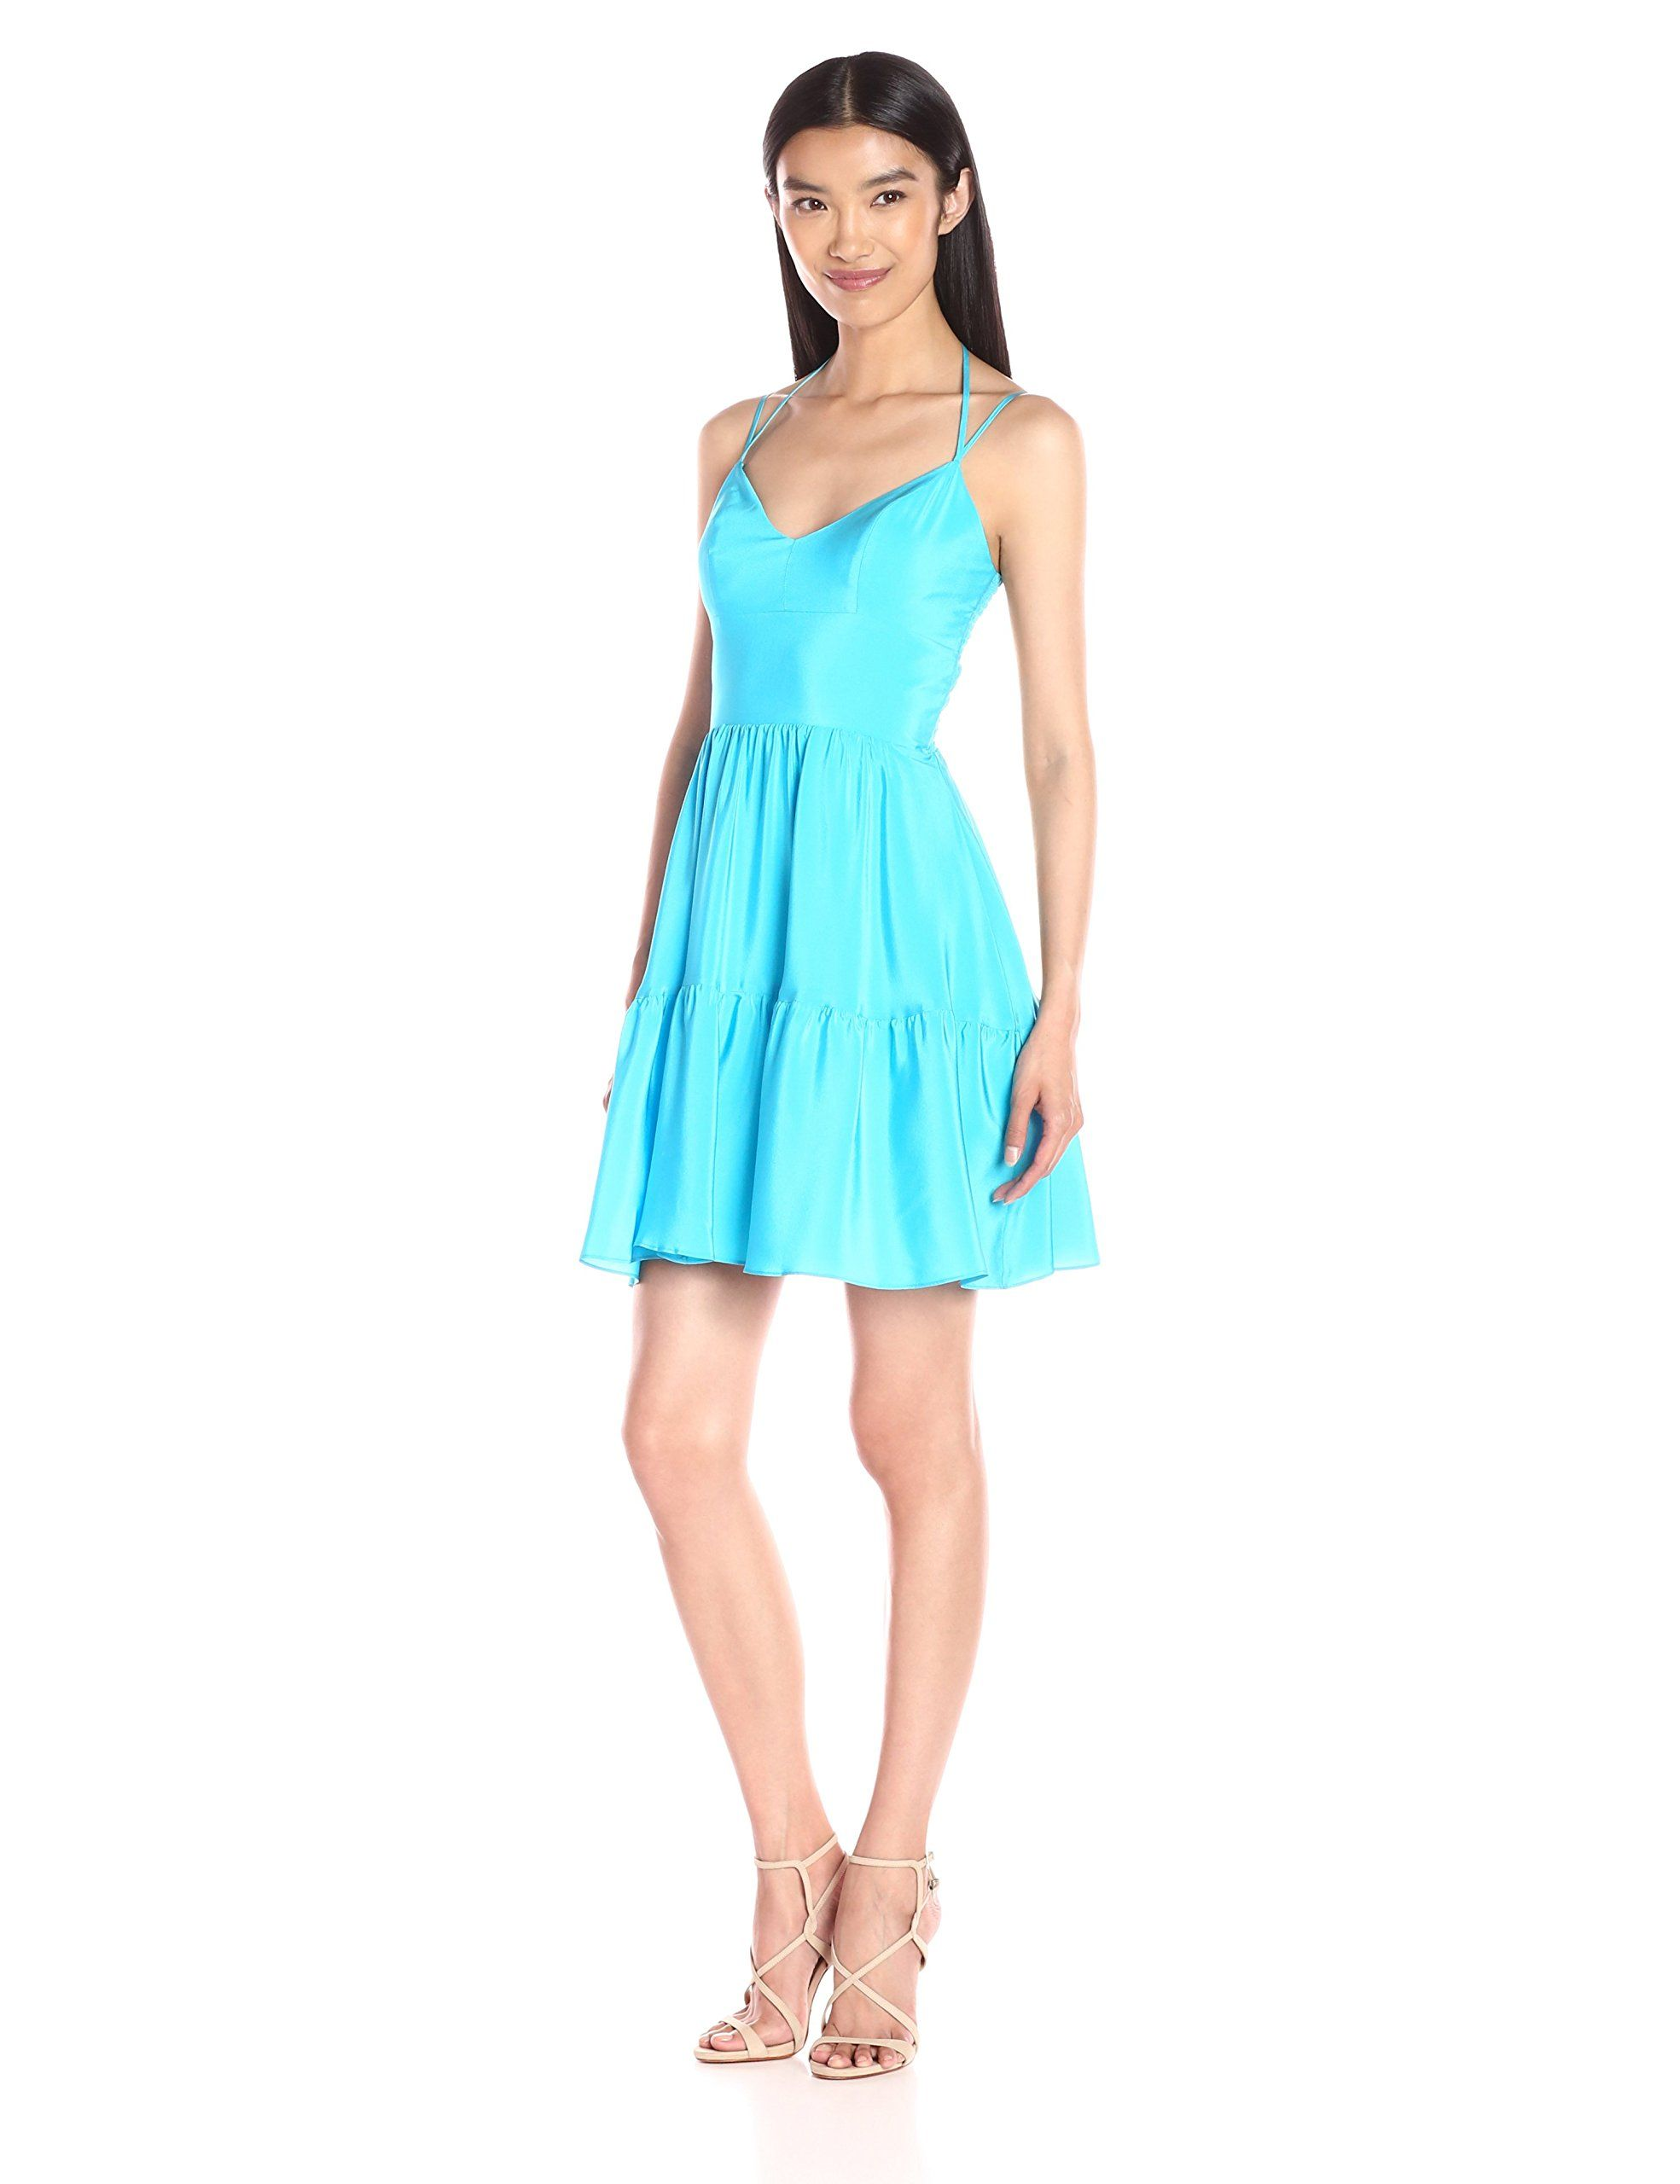 Women\'s Dresses for Wedding Night   Dress images